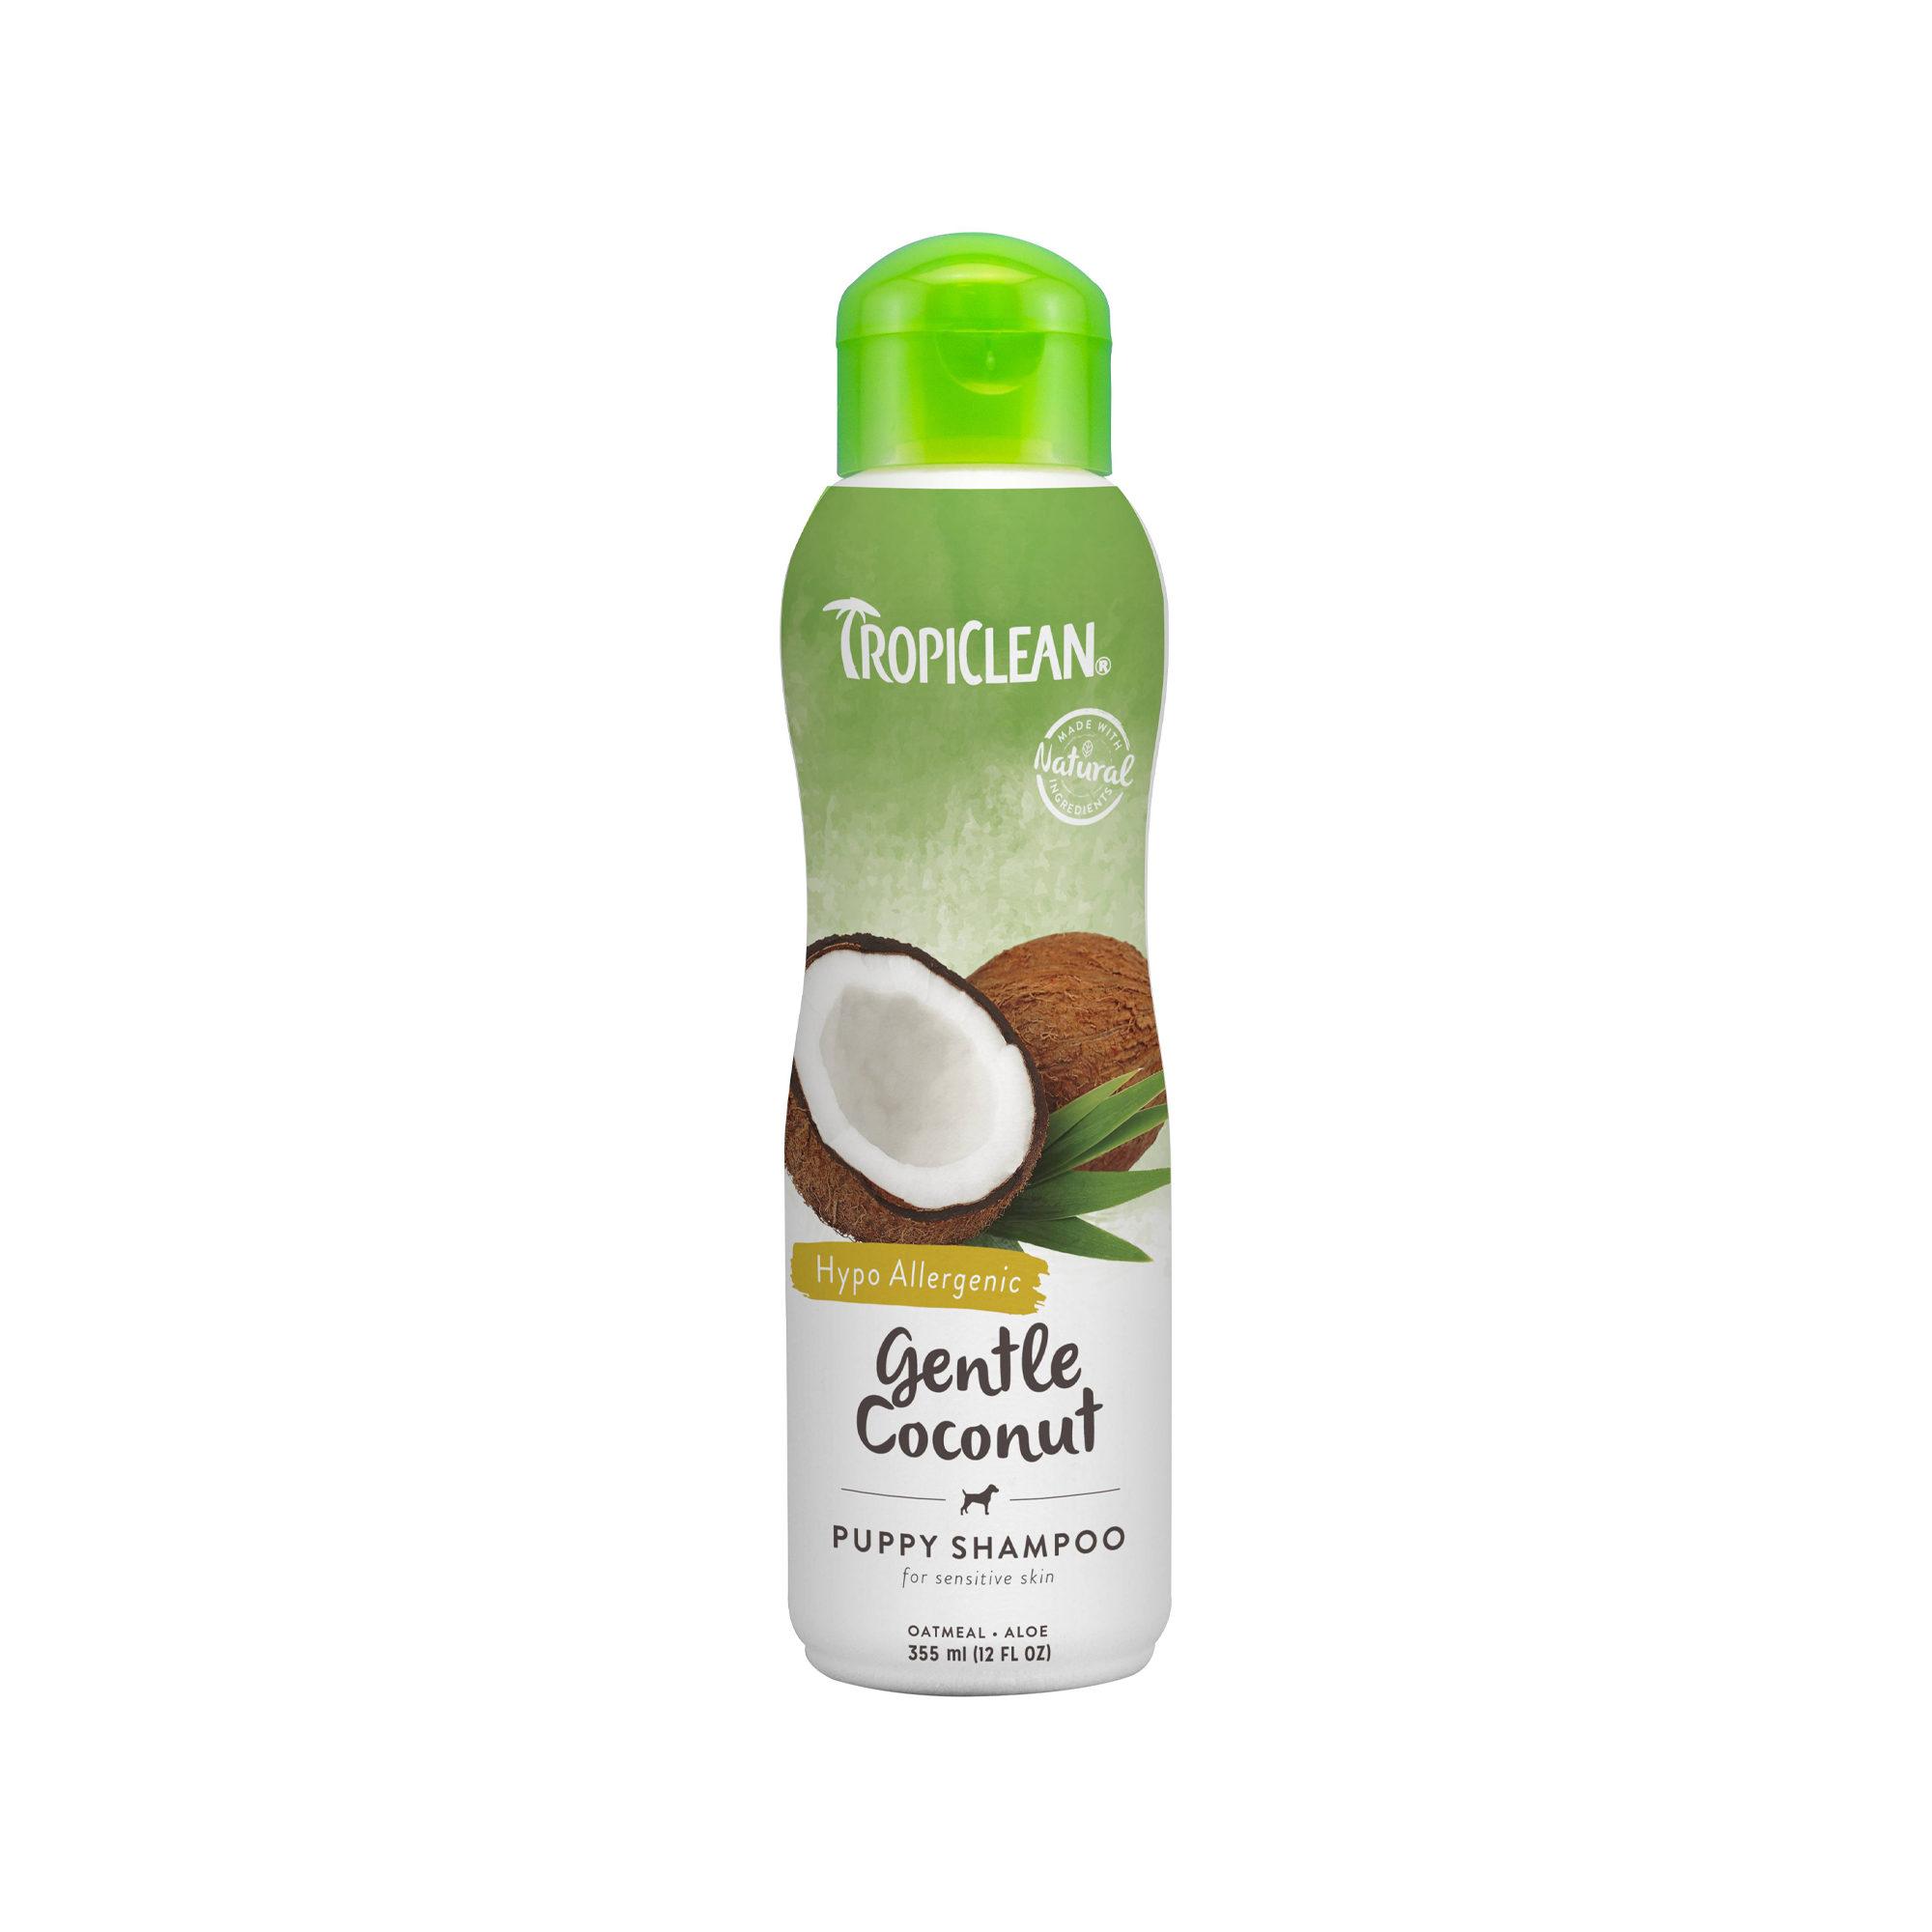 TropiClean Gentle Coconut Shampoo